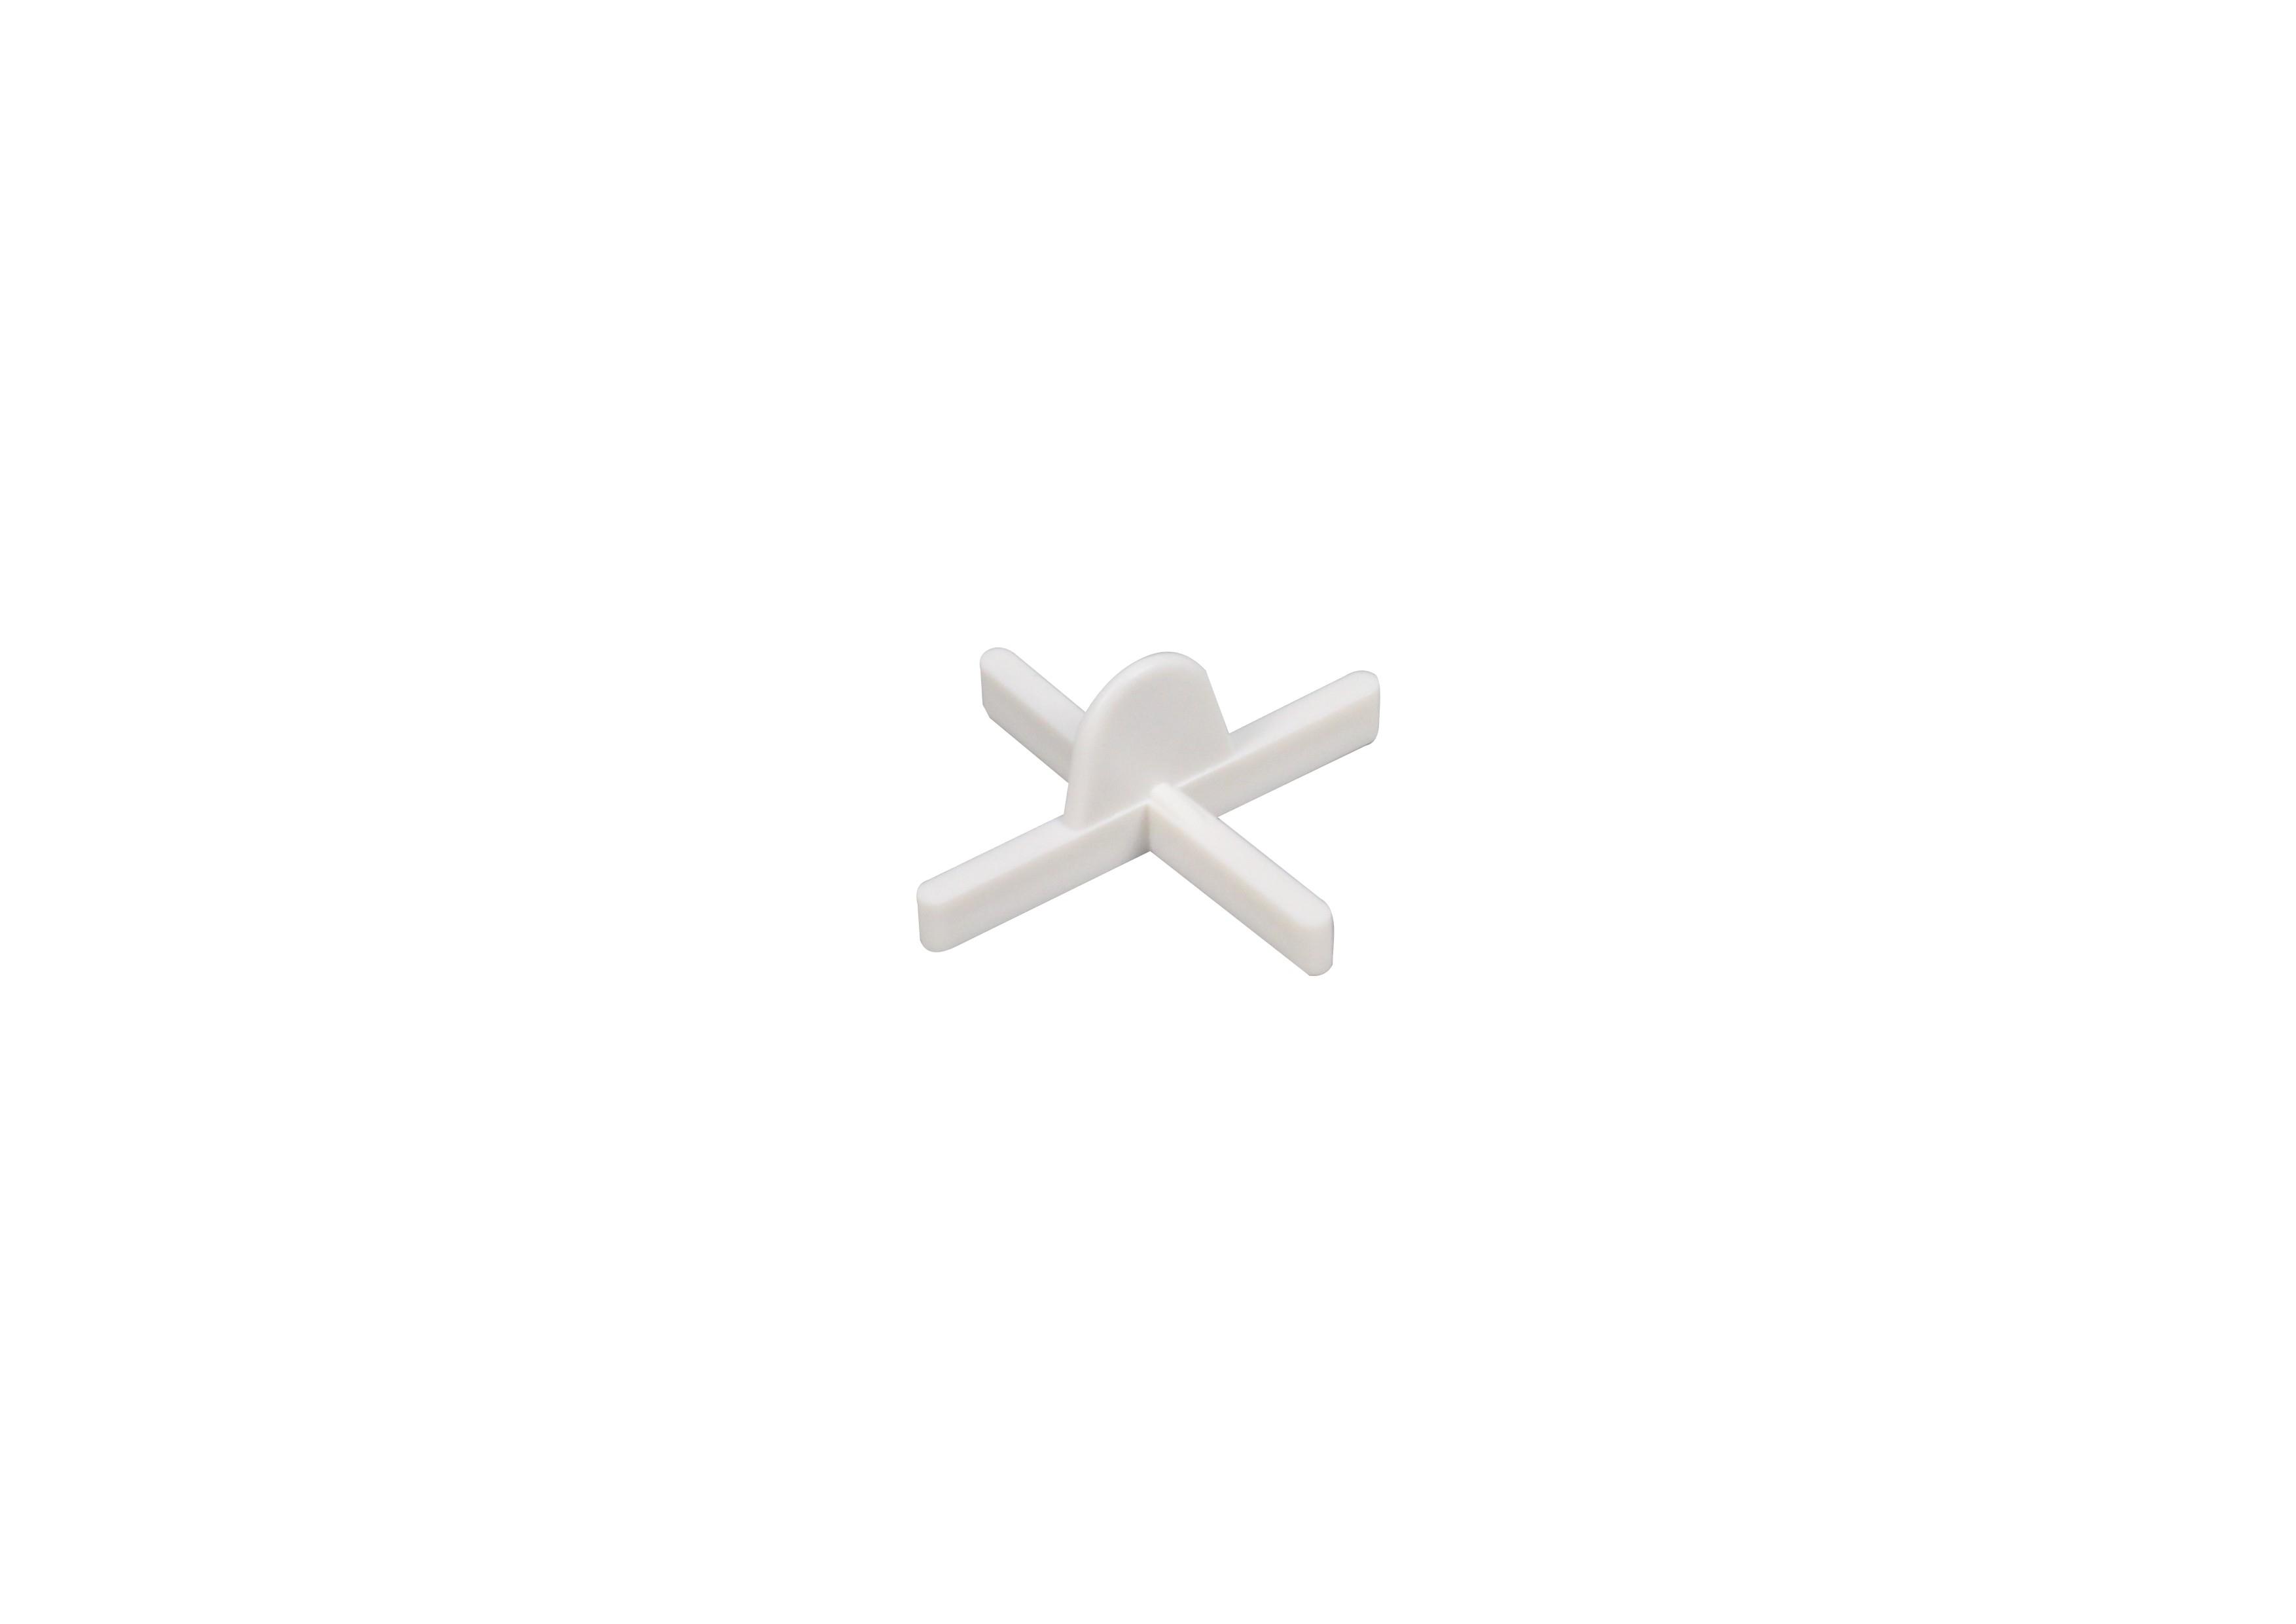 Fliesenkreuze, m. Griff Kubala 1.5mm, 100 St. |Artikel Nr. 1871